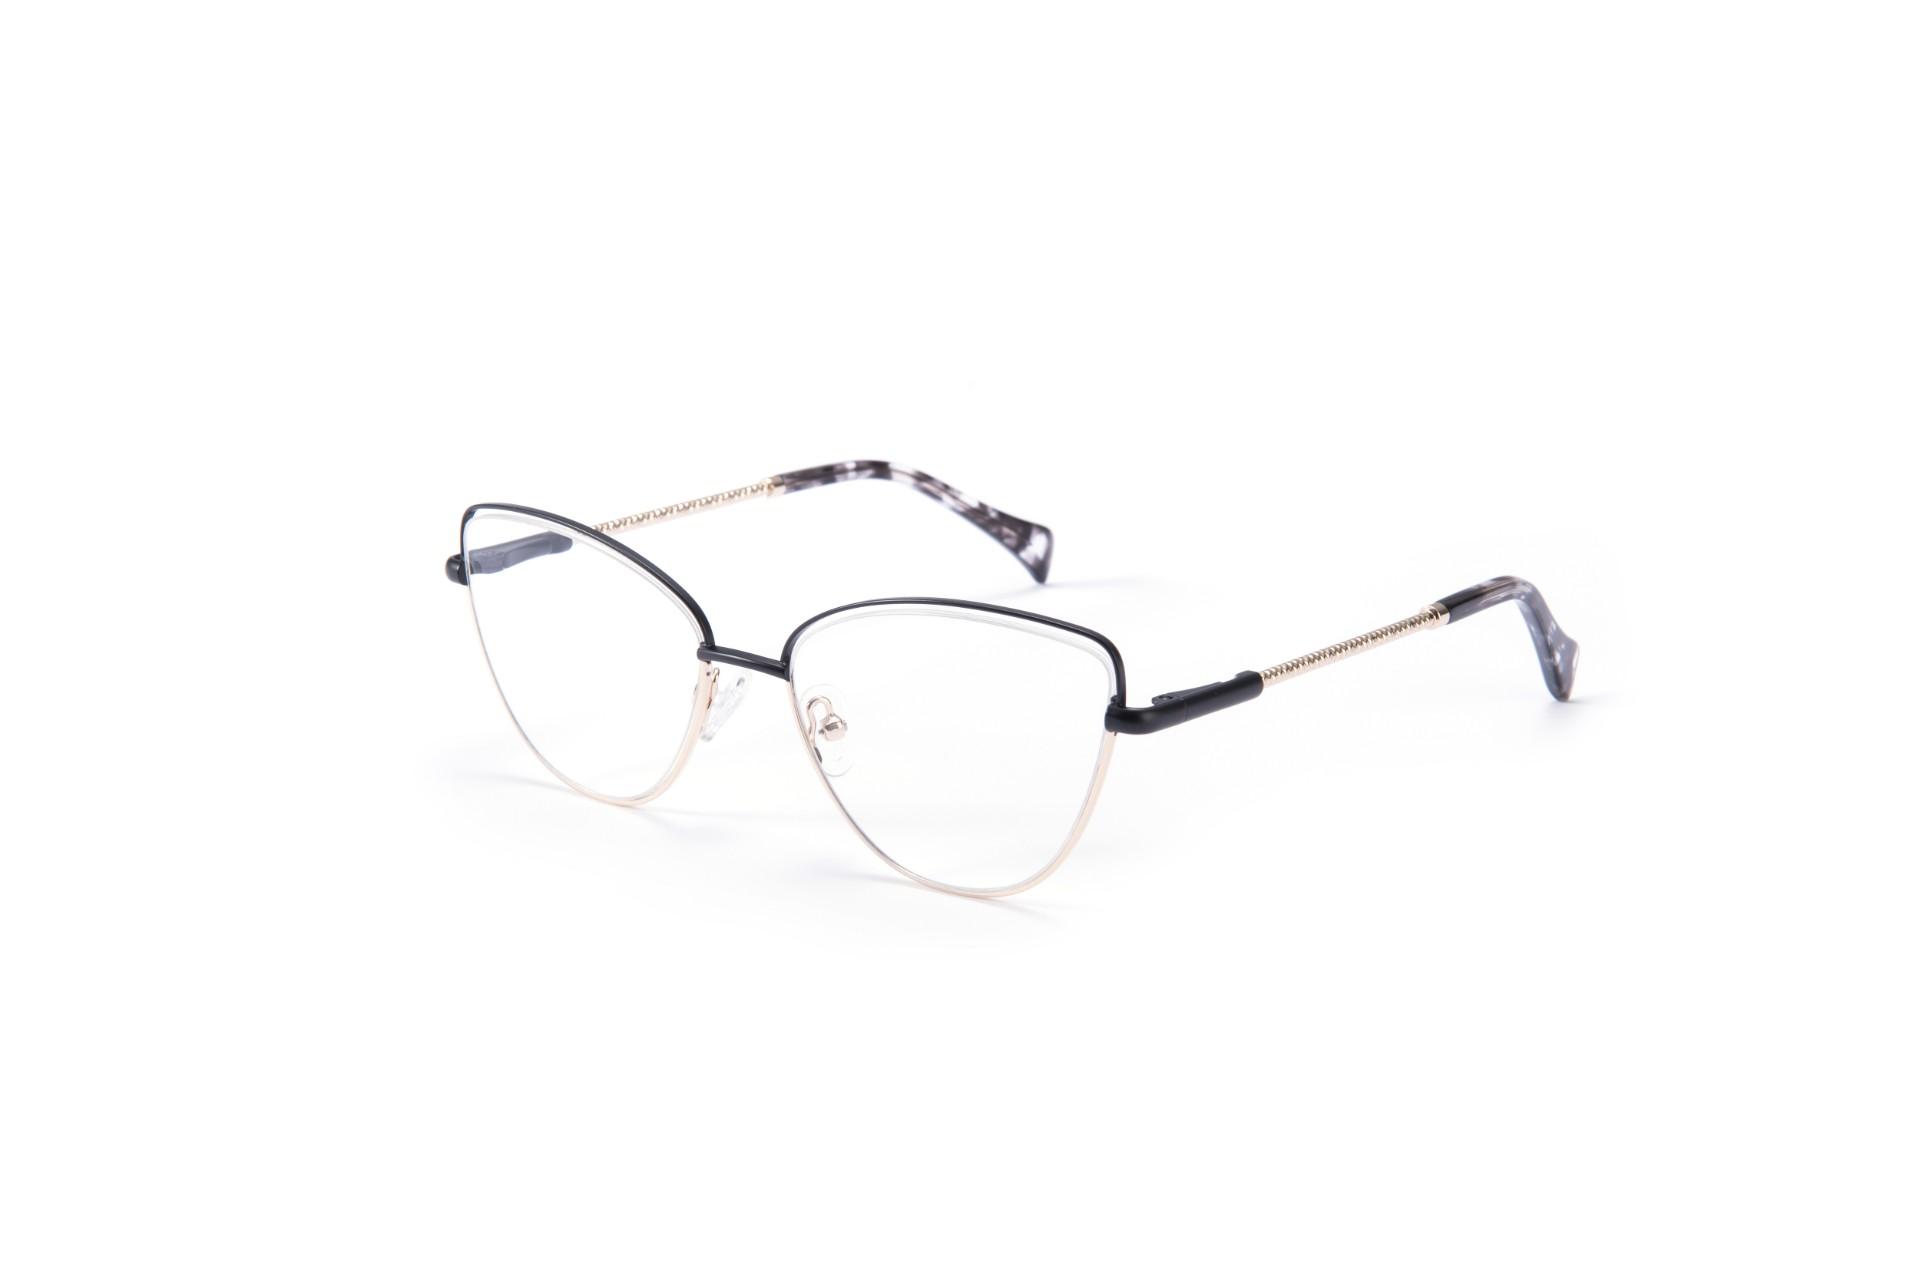 (RTS) EM1101 Metal glasses 2021 wholesale vr/ar glasses optical glass lens mens frames optical glasses with small quantity